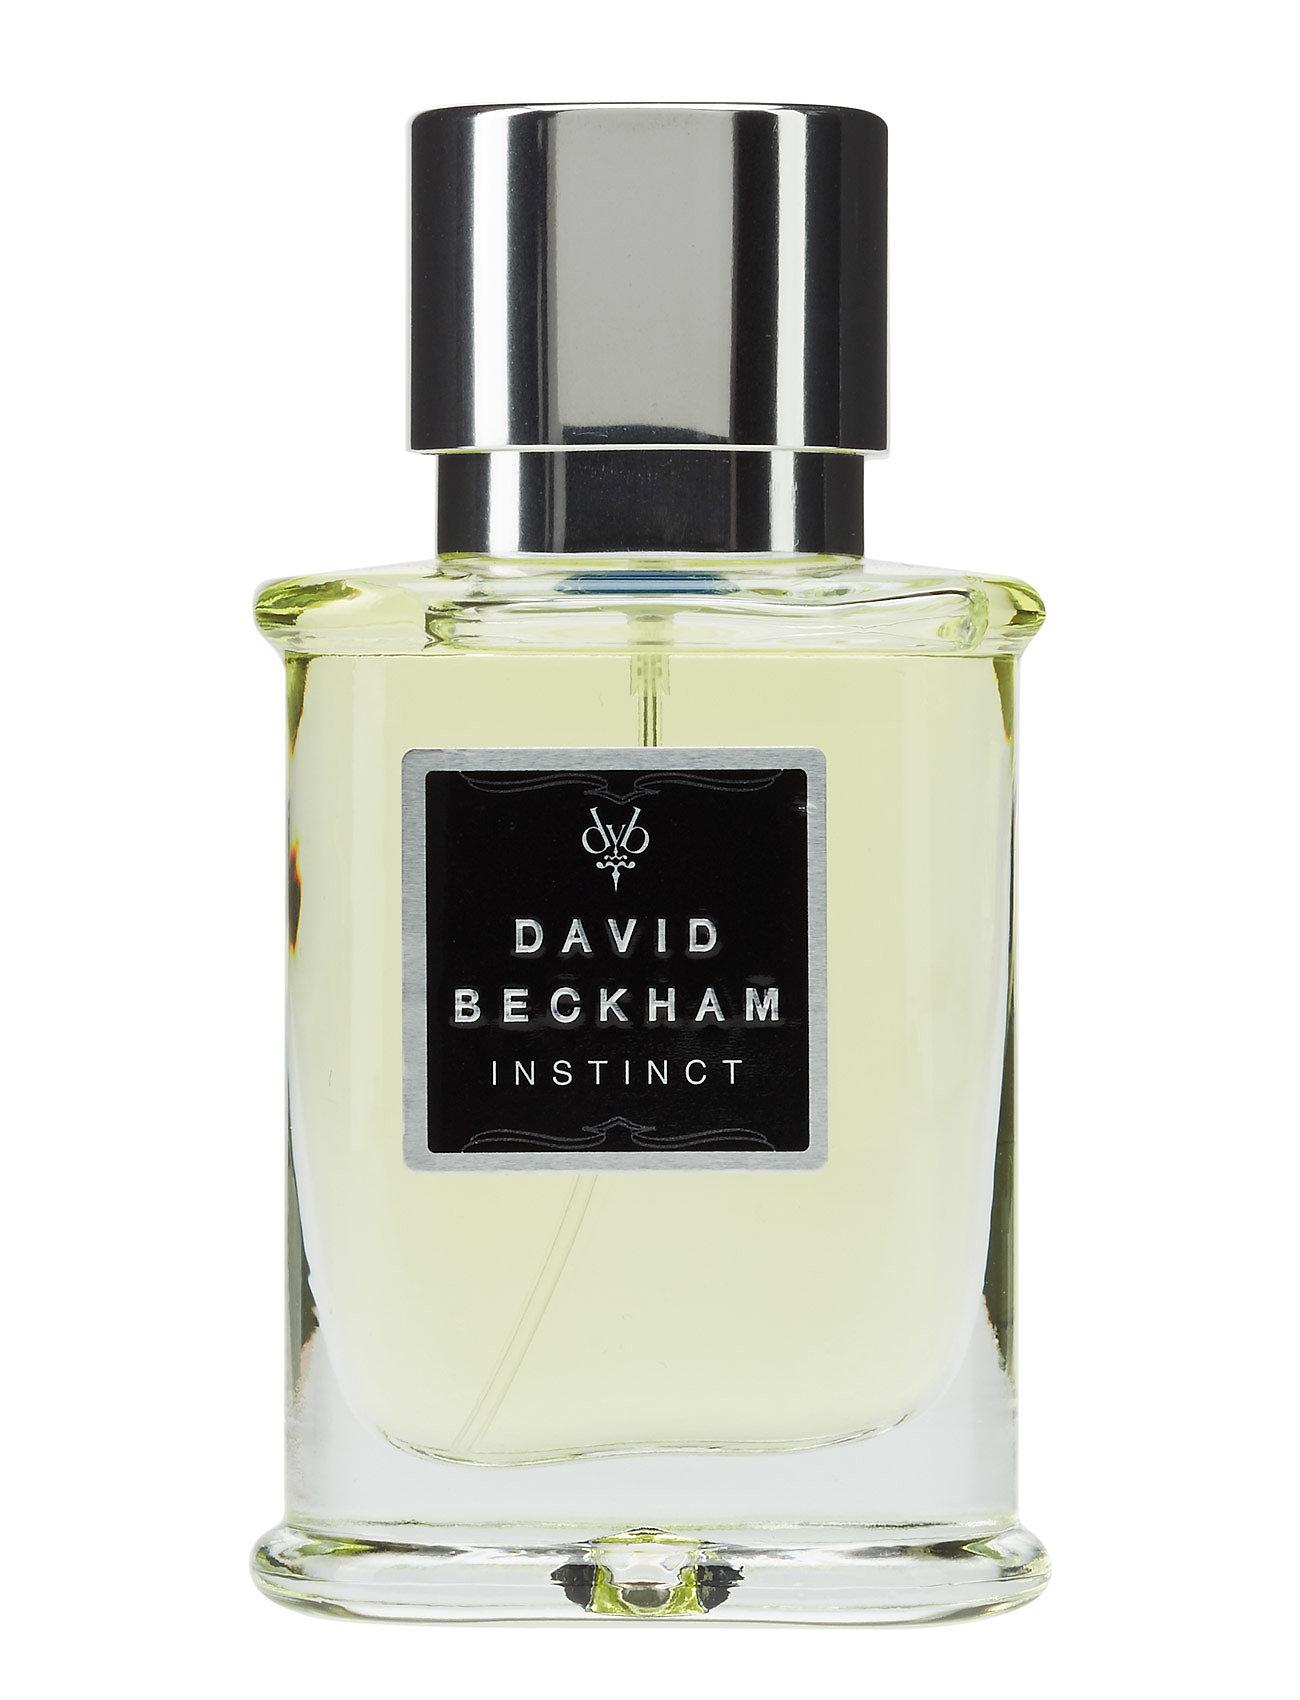 david beckham – David beckham instinct eau de toile fra boozt.com dk